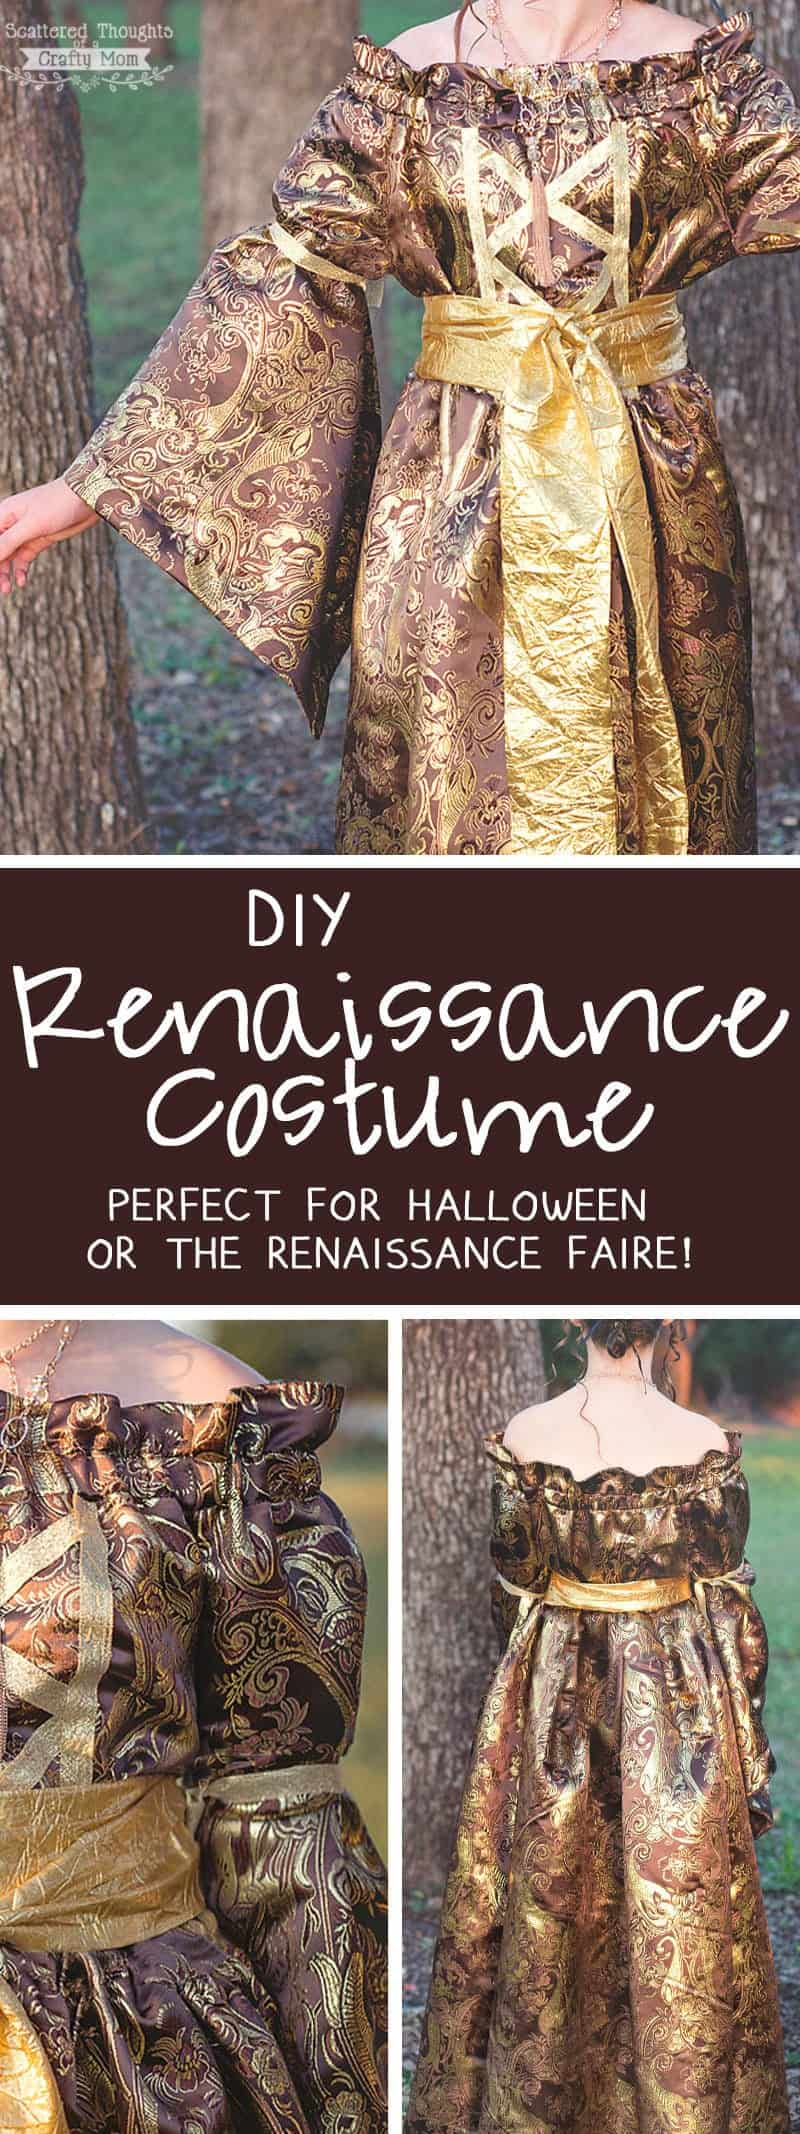 Medieval Princess Halloween Costume (DIY Renaissance Dress)